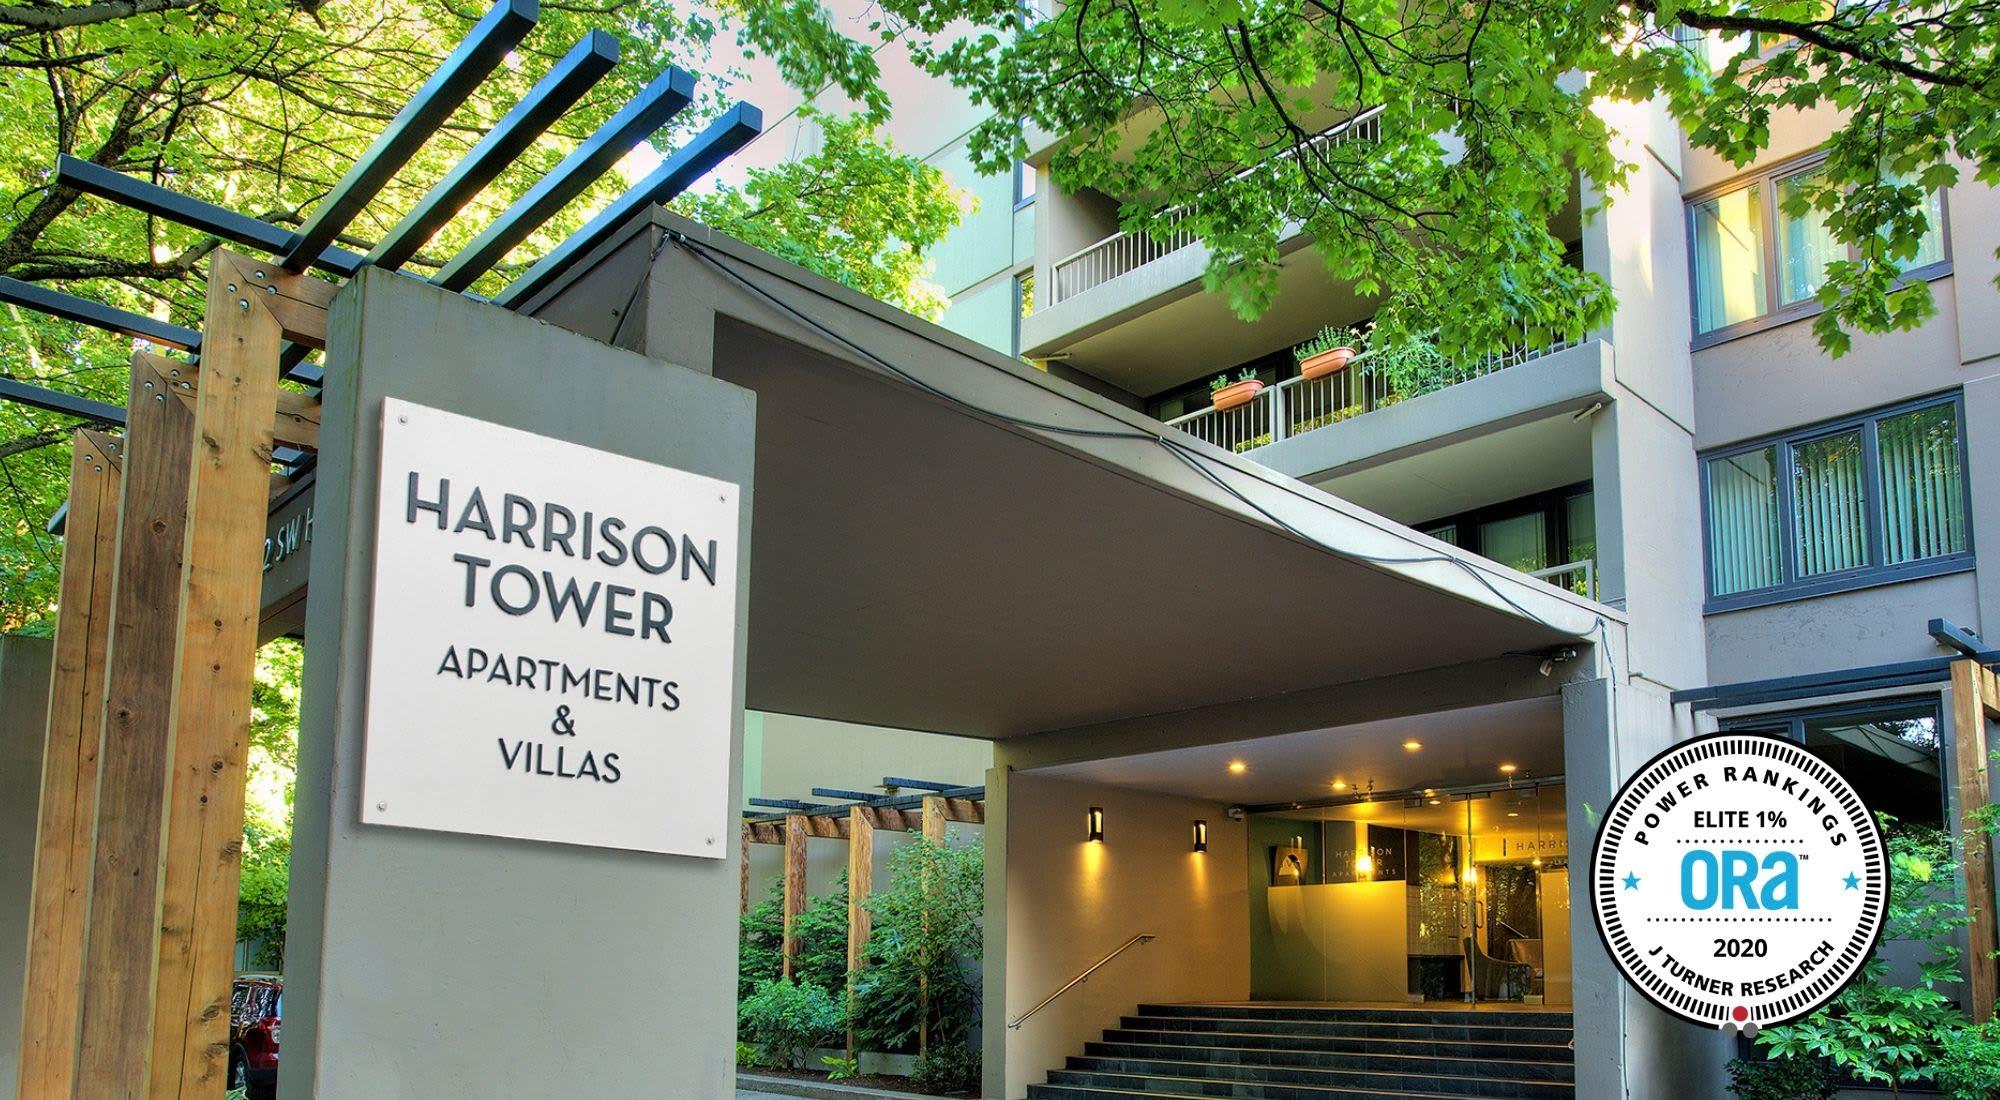 Harrison Tower apartments in Portland, Oregon